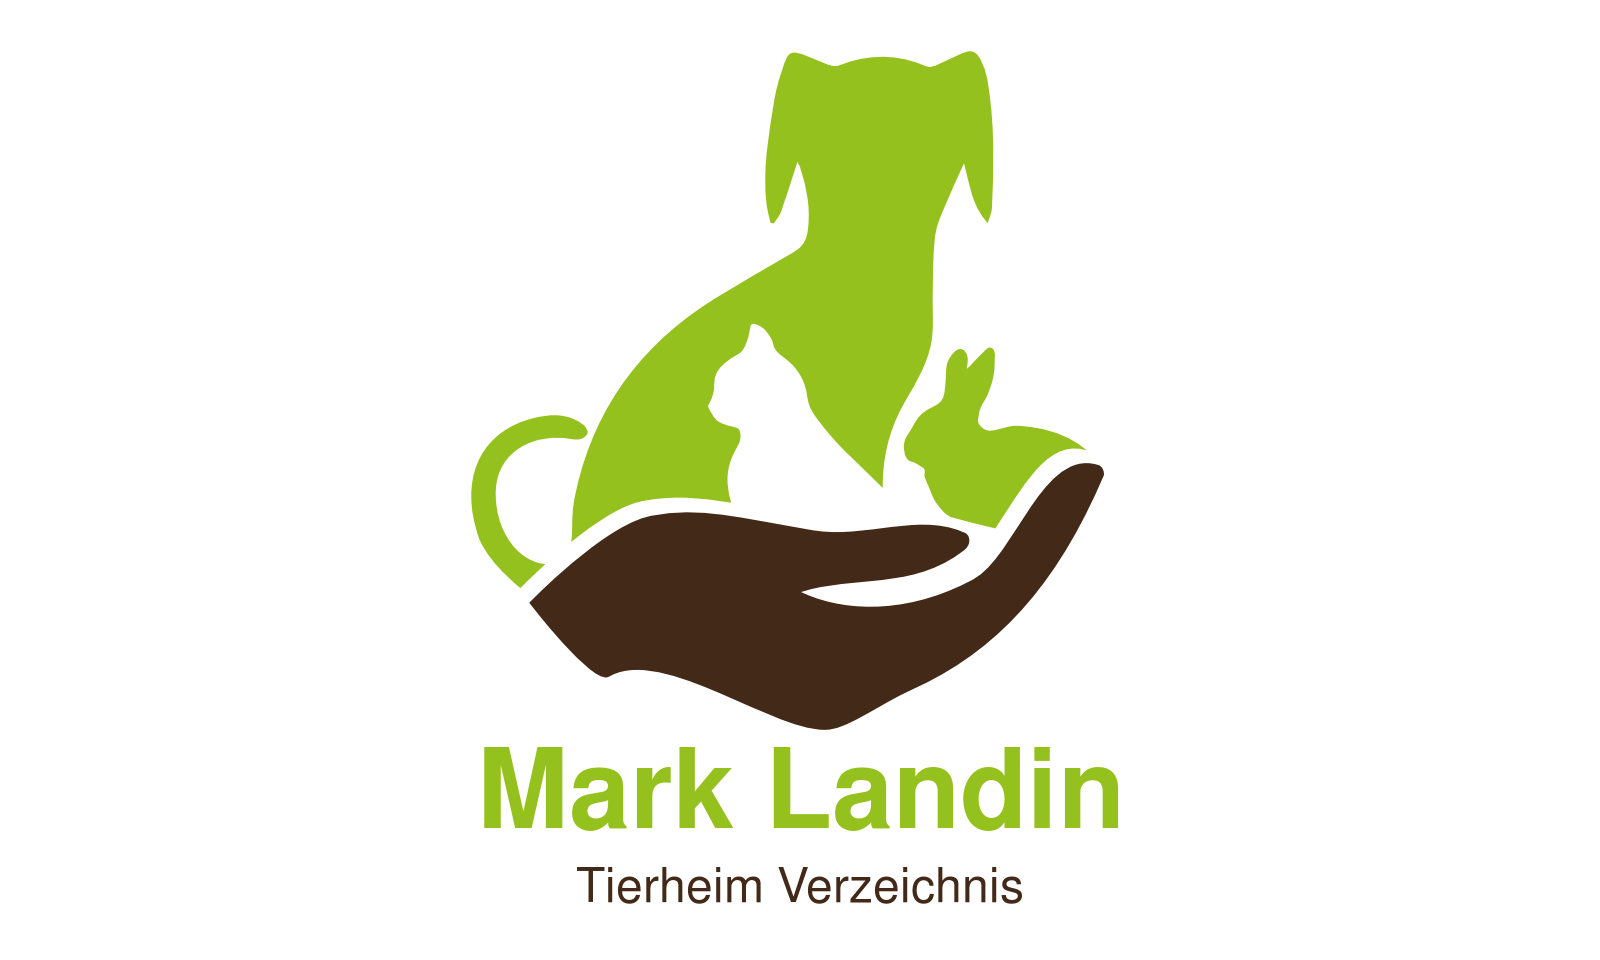 Tierheim Mark Landin